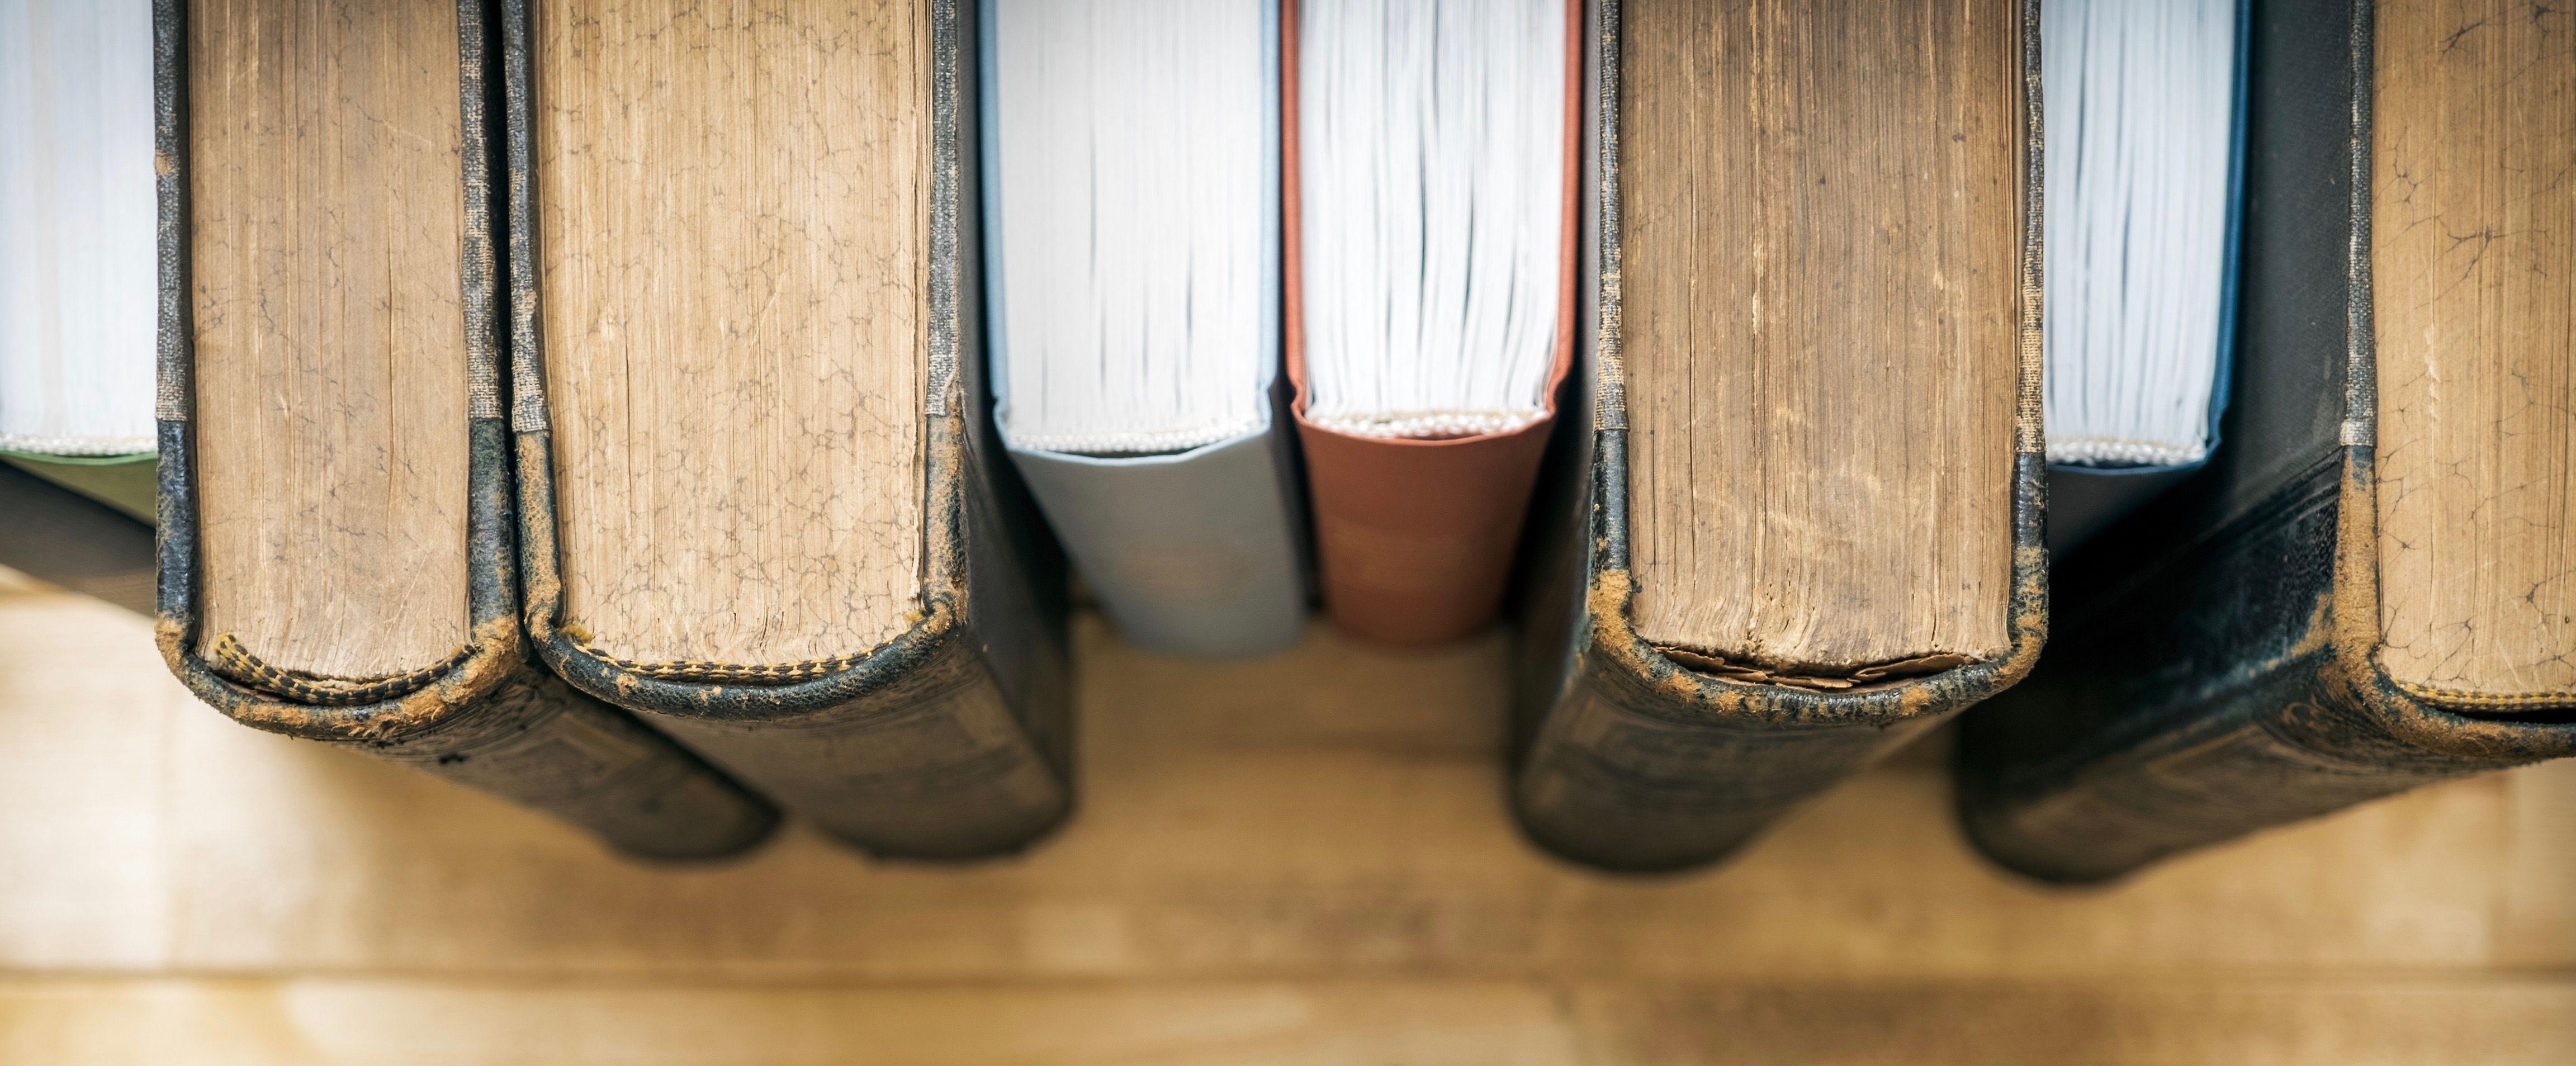 marketing-books-to-read-now-compressor.jpg